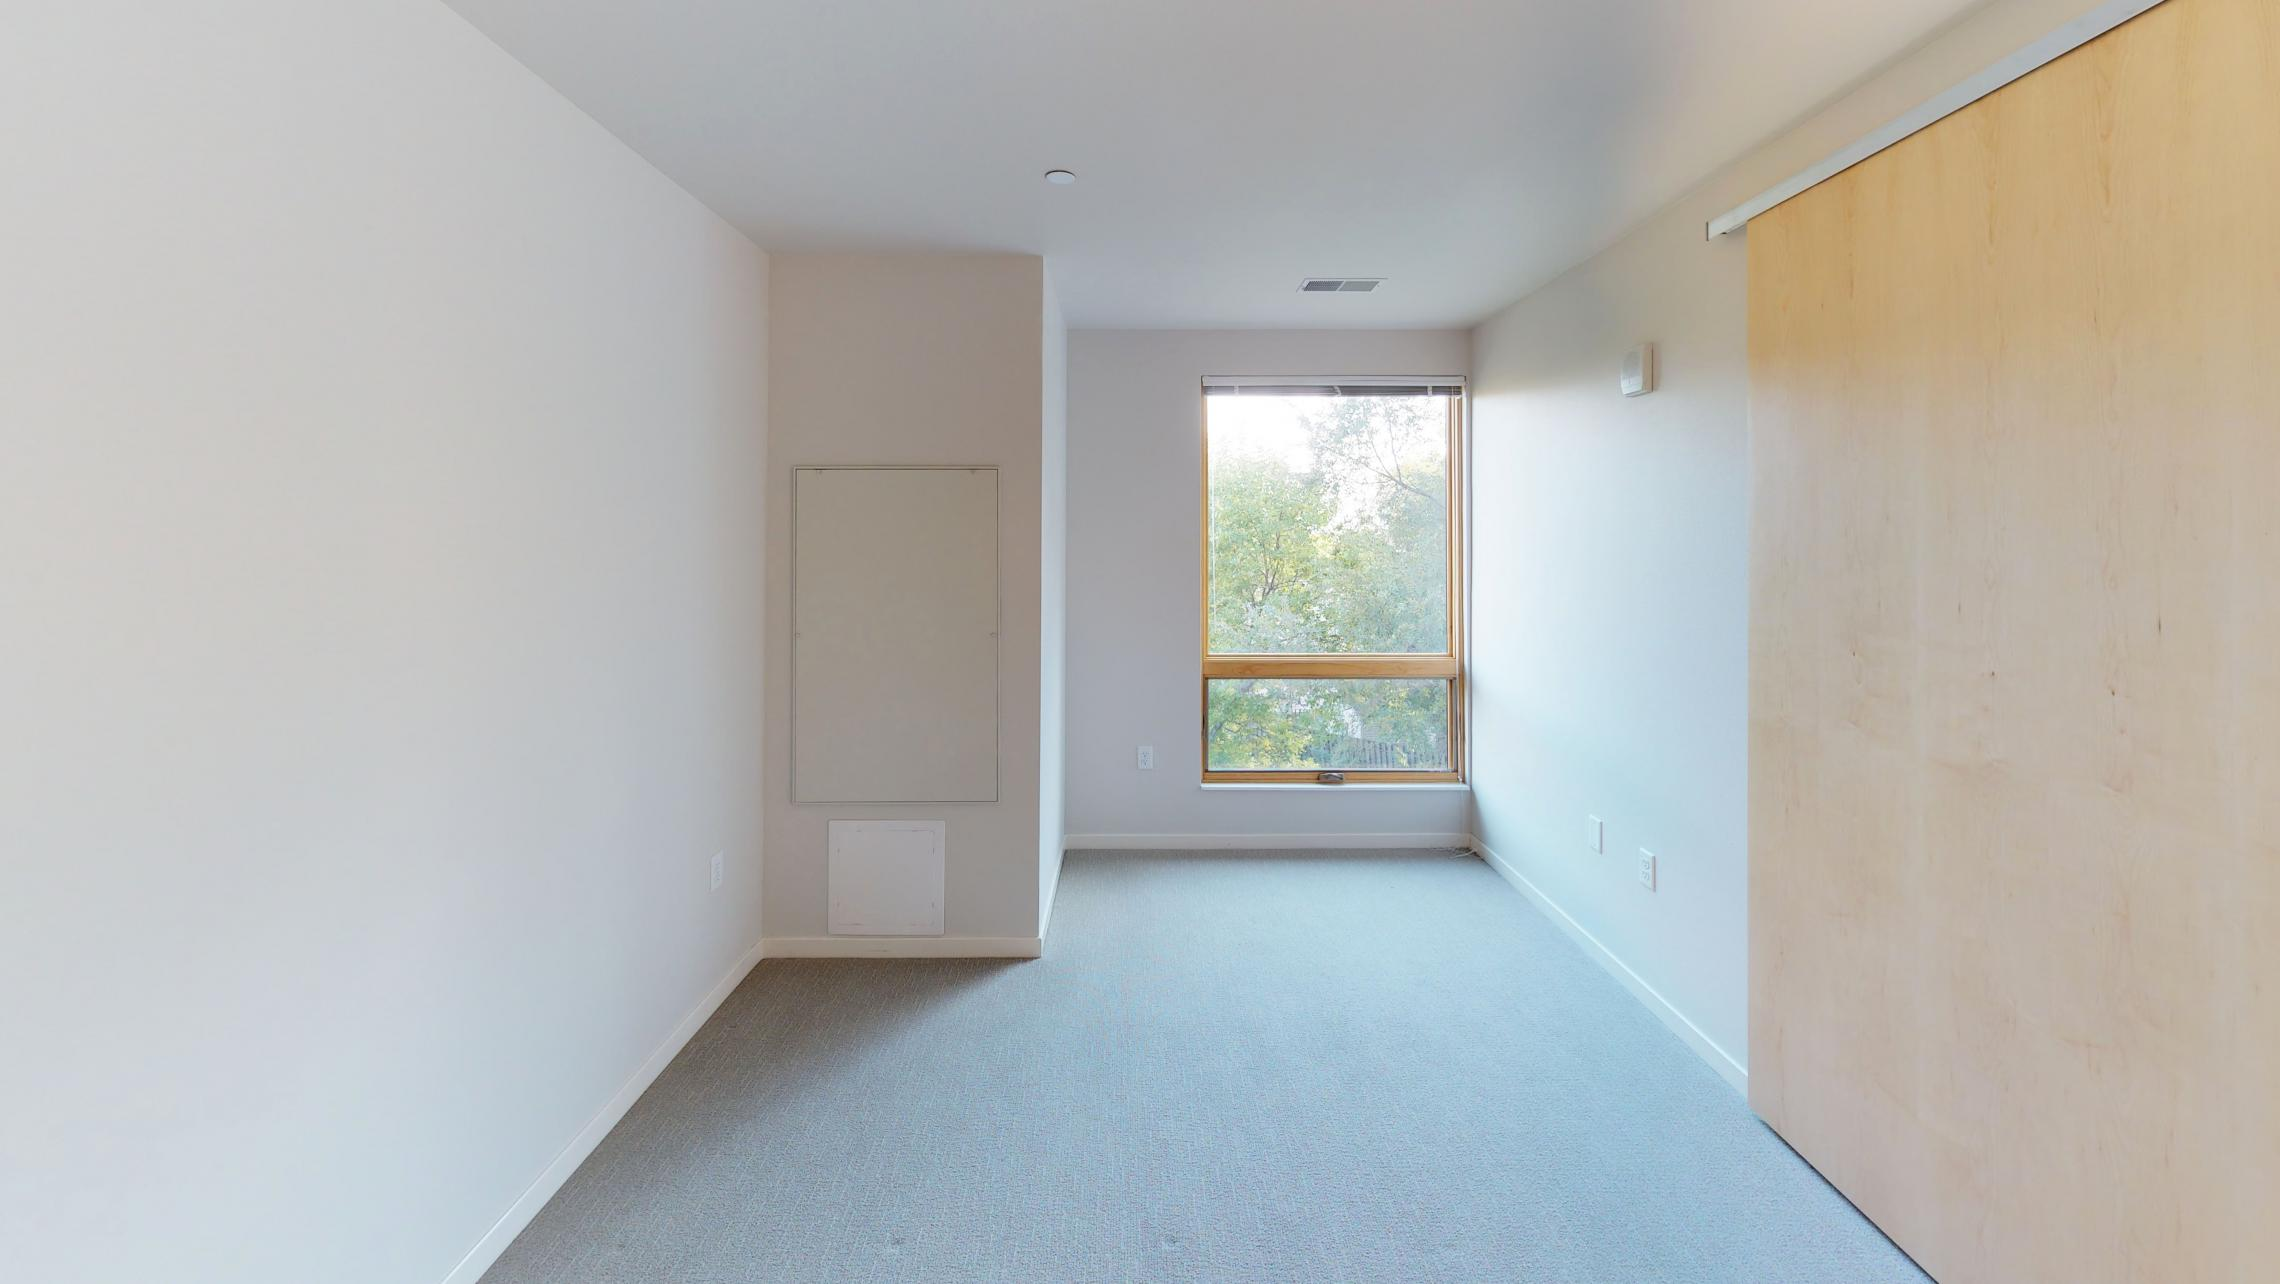 Quarter-Row-Yards-Apartment-326-Corner-Windows-One-Bedroom-Modern-Upscale-Fitness-Lounge-Courtyard-Downtown-Madison-Balcony-Amenities-Luxury